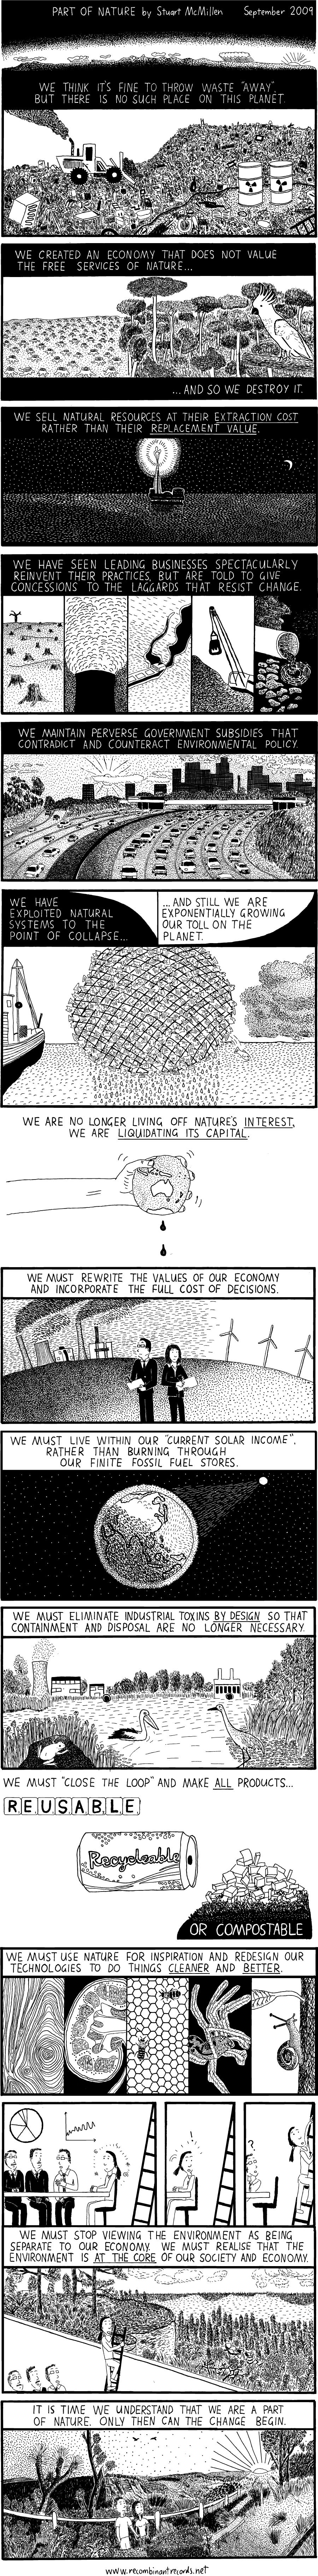 Part of Nature cartoon